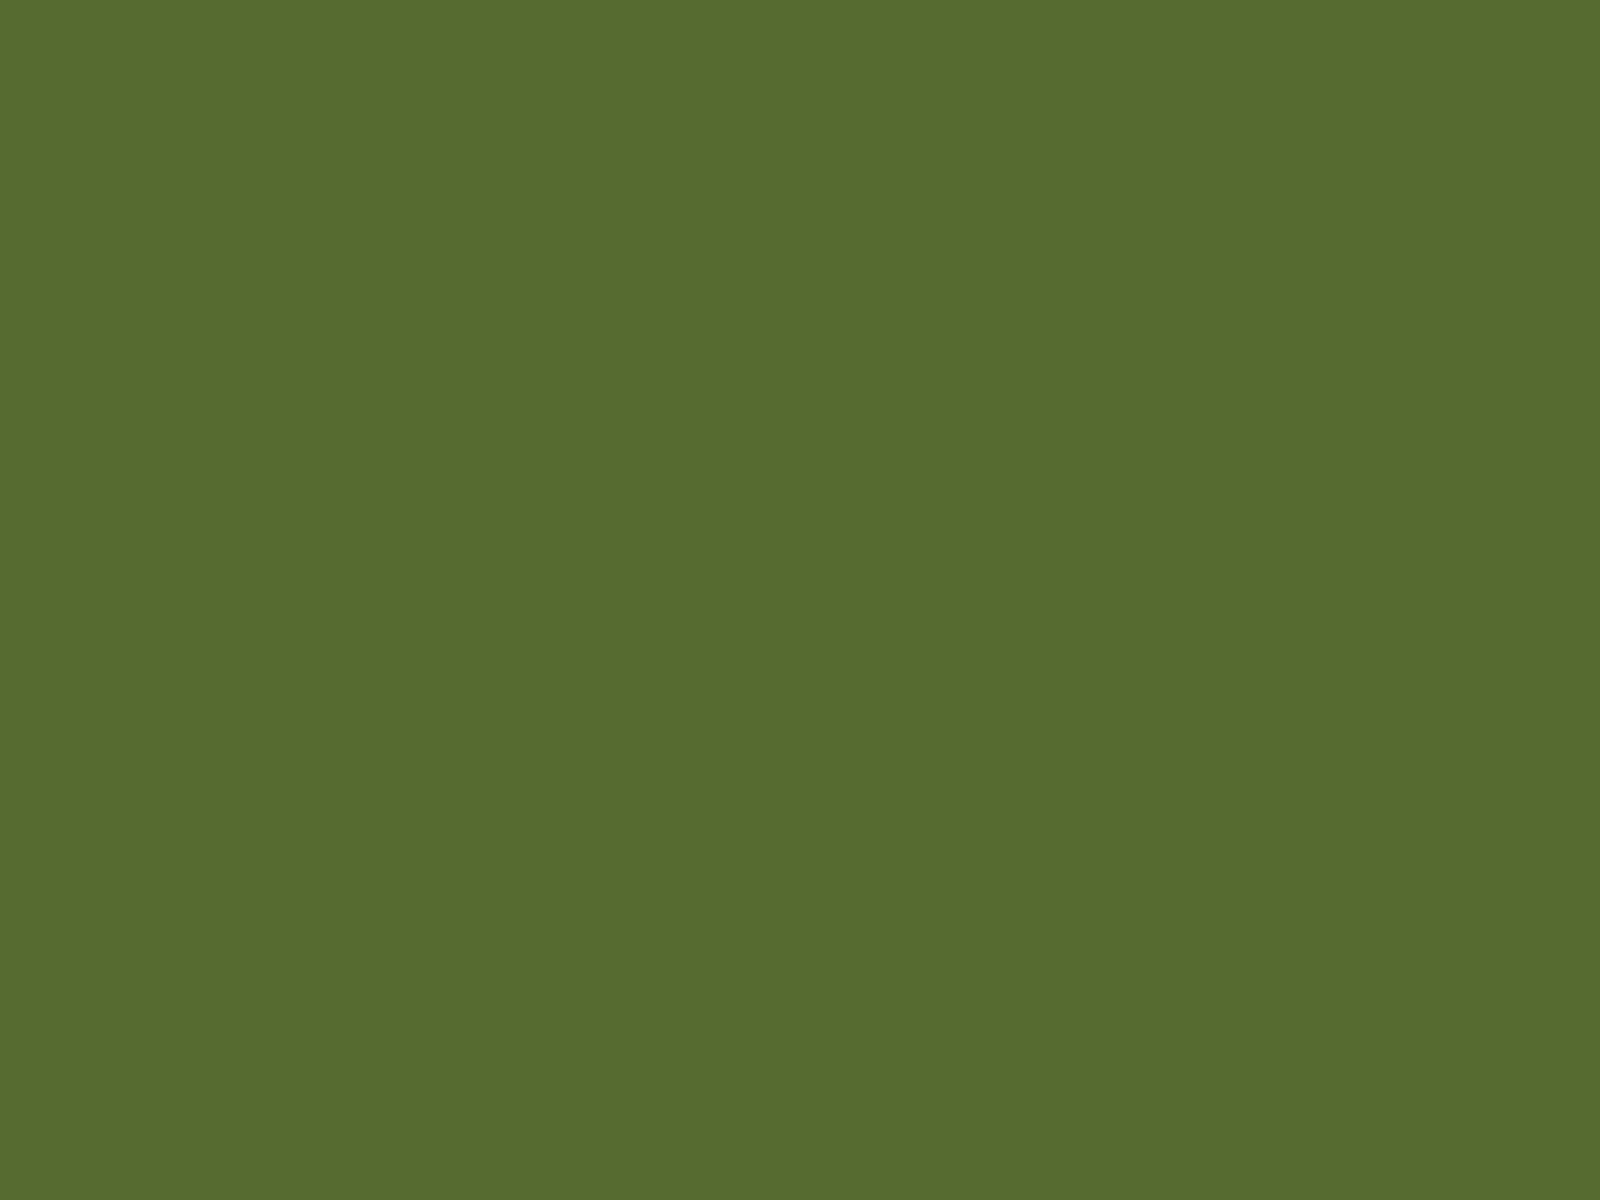 1600x1200 Dark Olive Green Solid Color Background